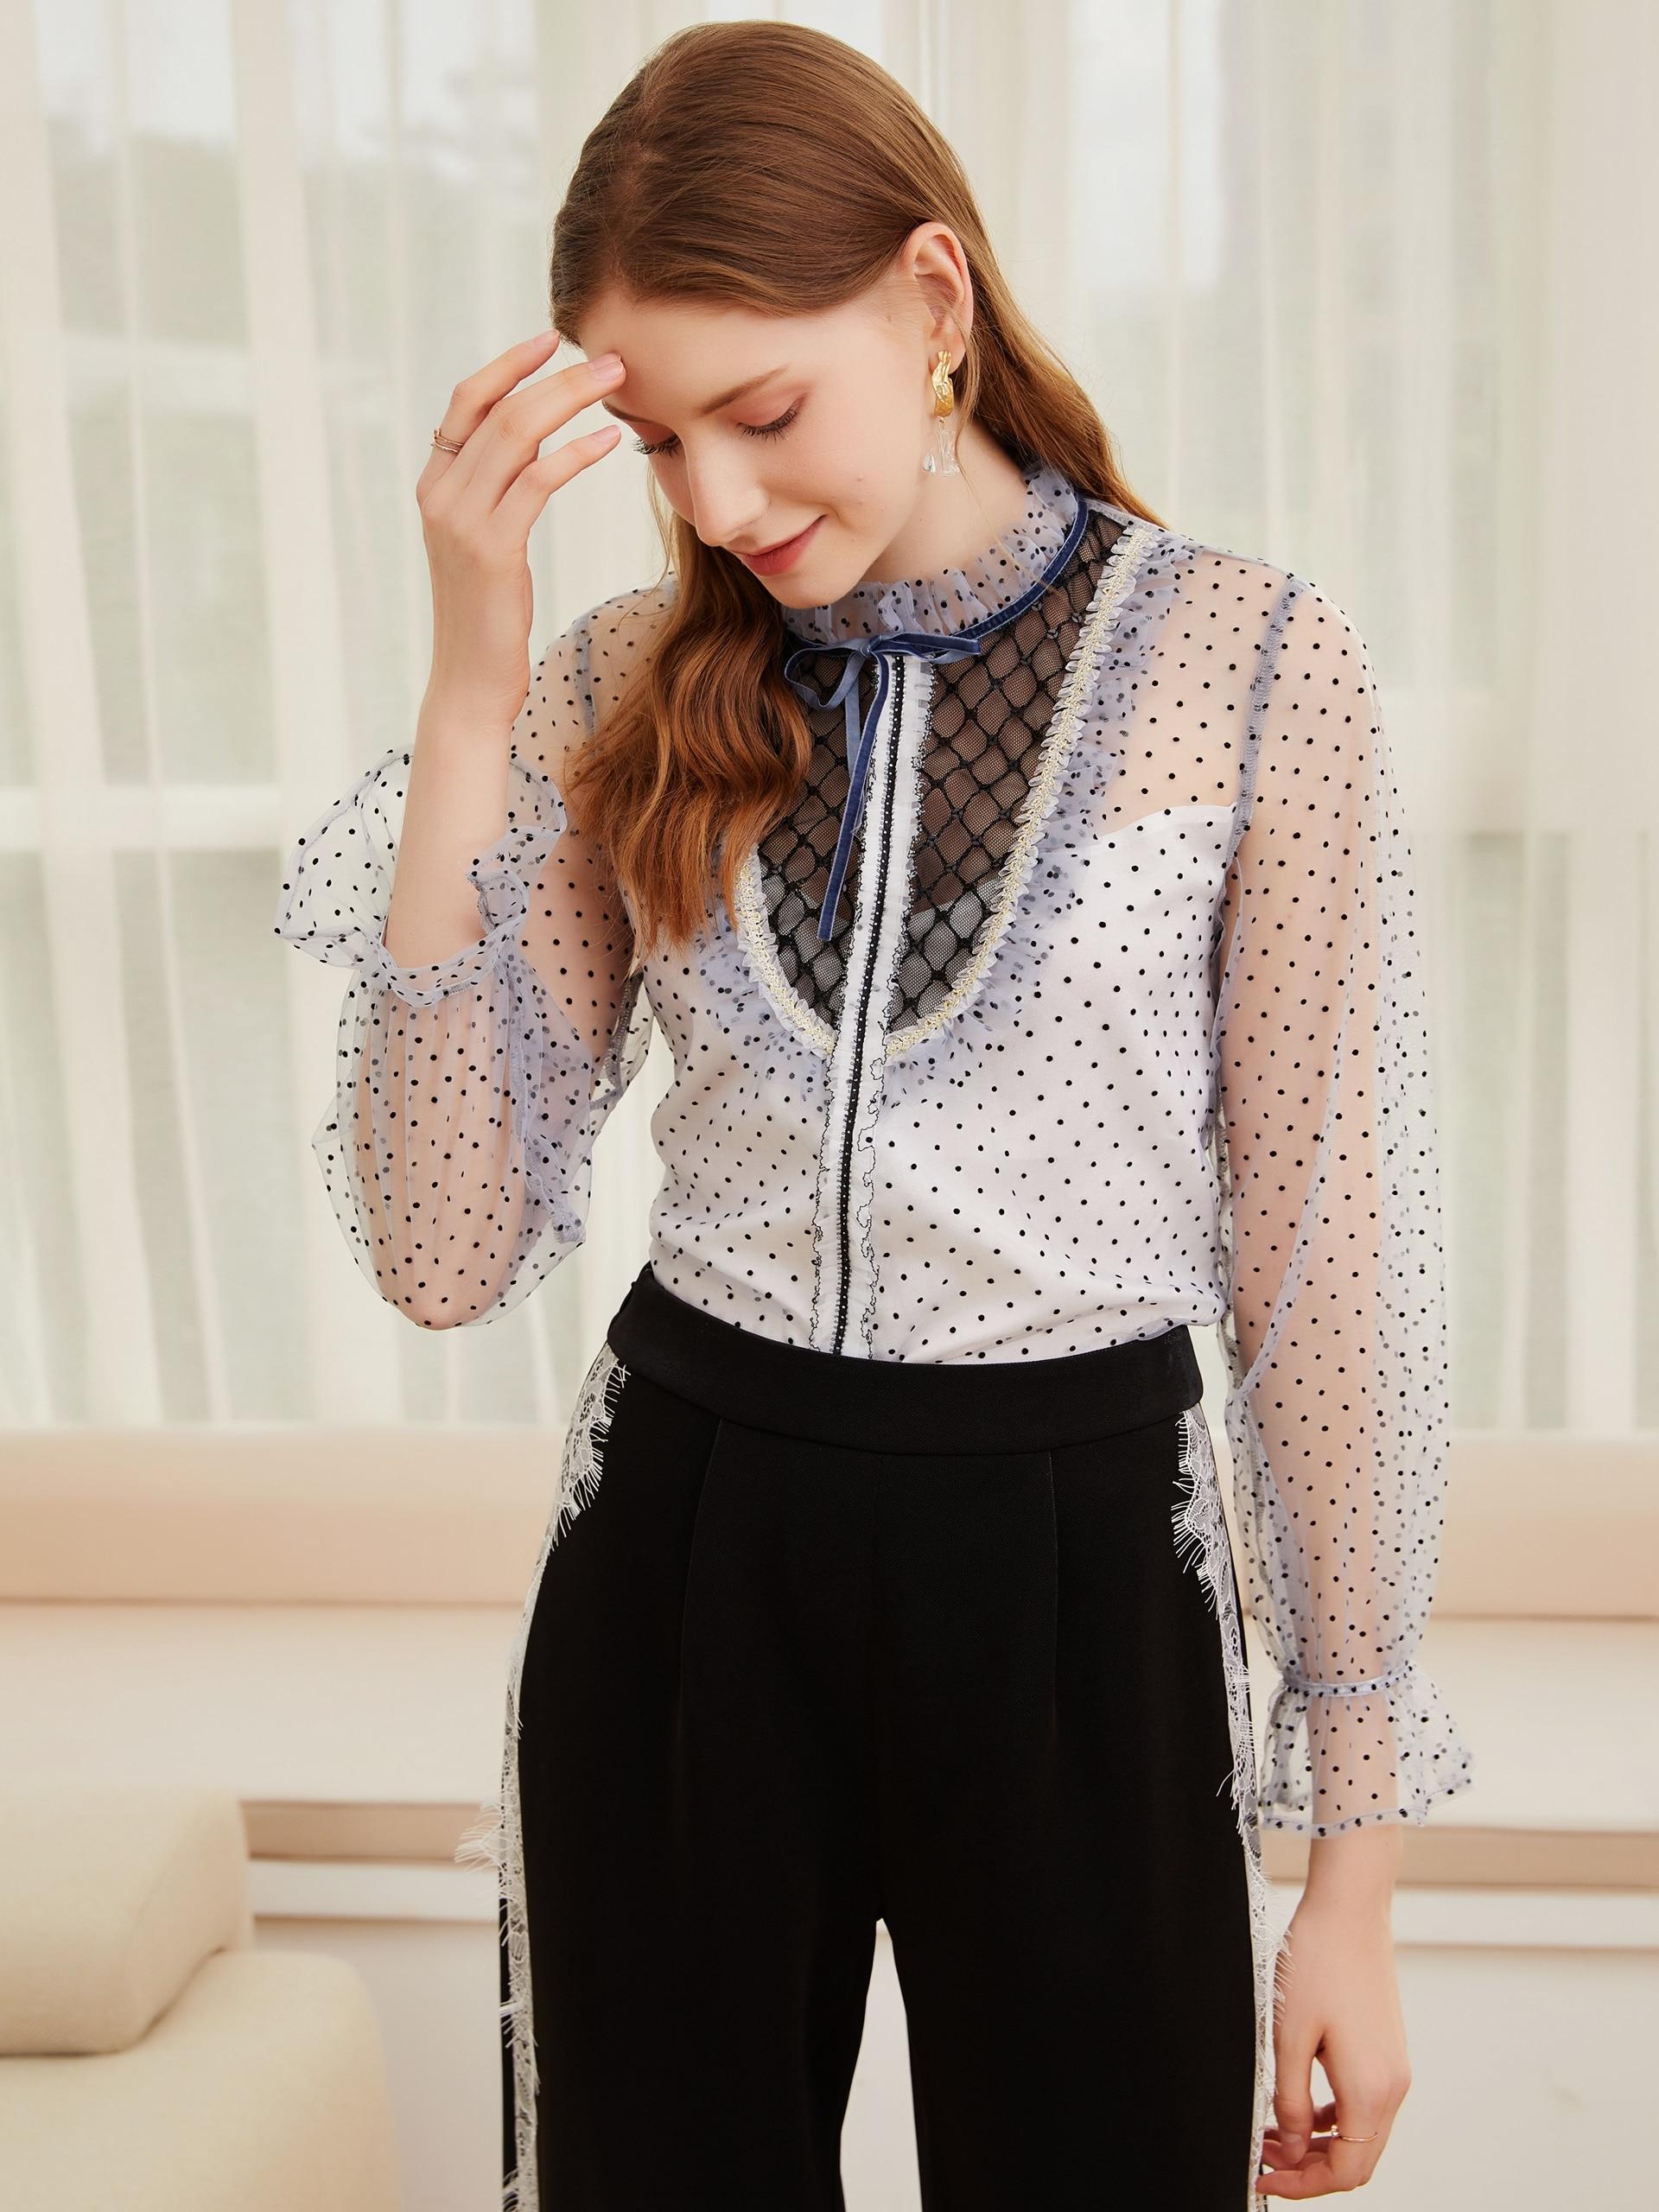 2021 spring and autumn new chiffon shirt retro temperament women's shirt long sleeve ear edge small